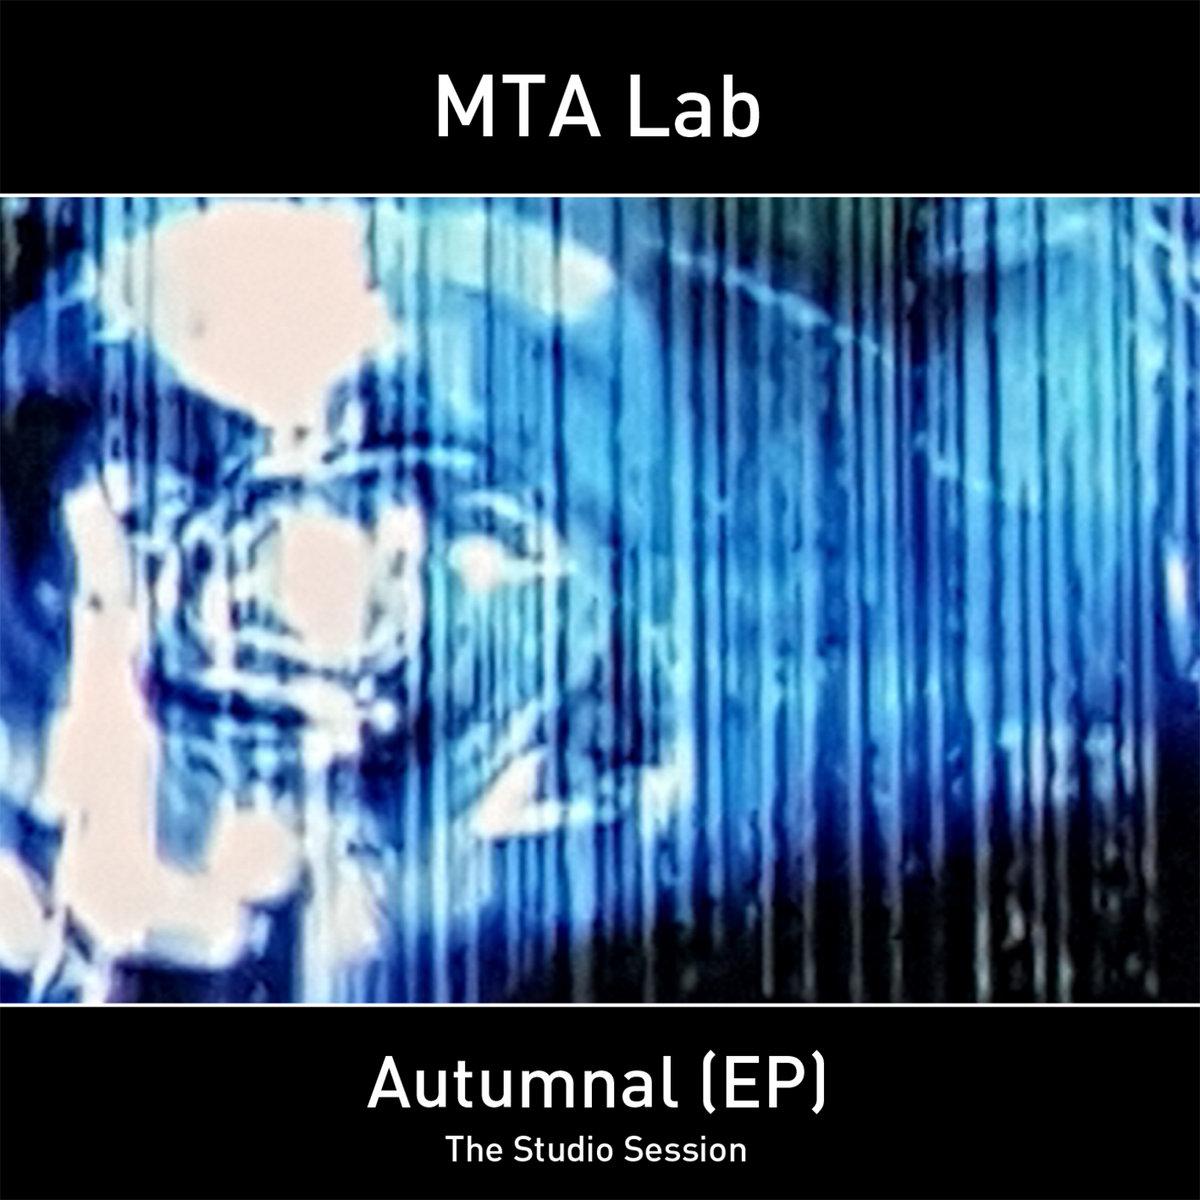 Autumnal (EP 24Bit) | MTA Lab